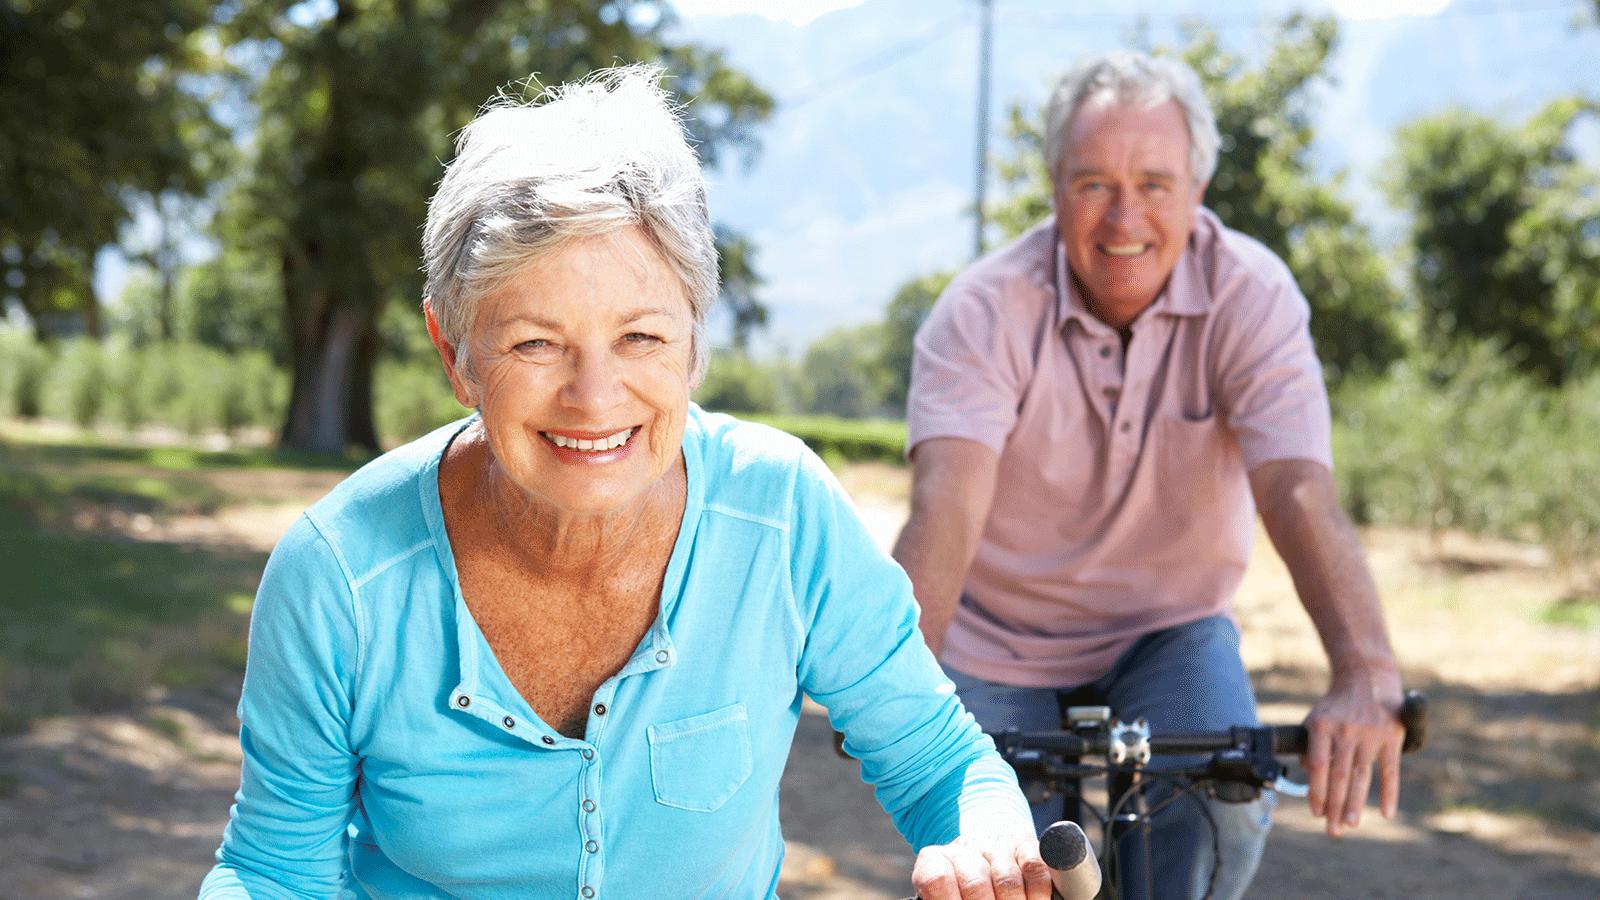 seguro de renta vitalicia